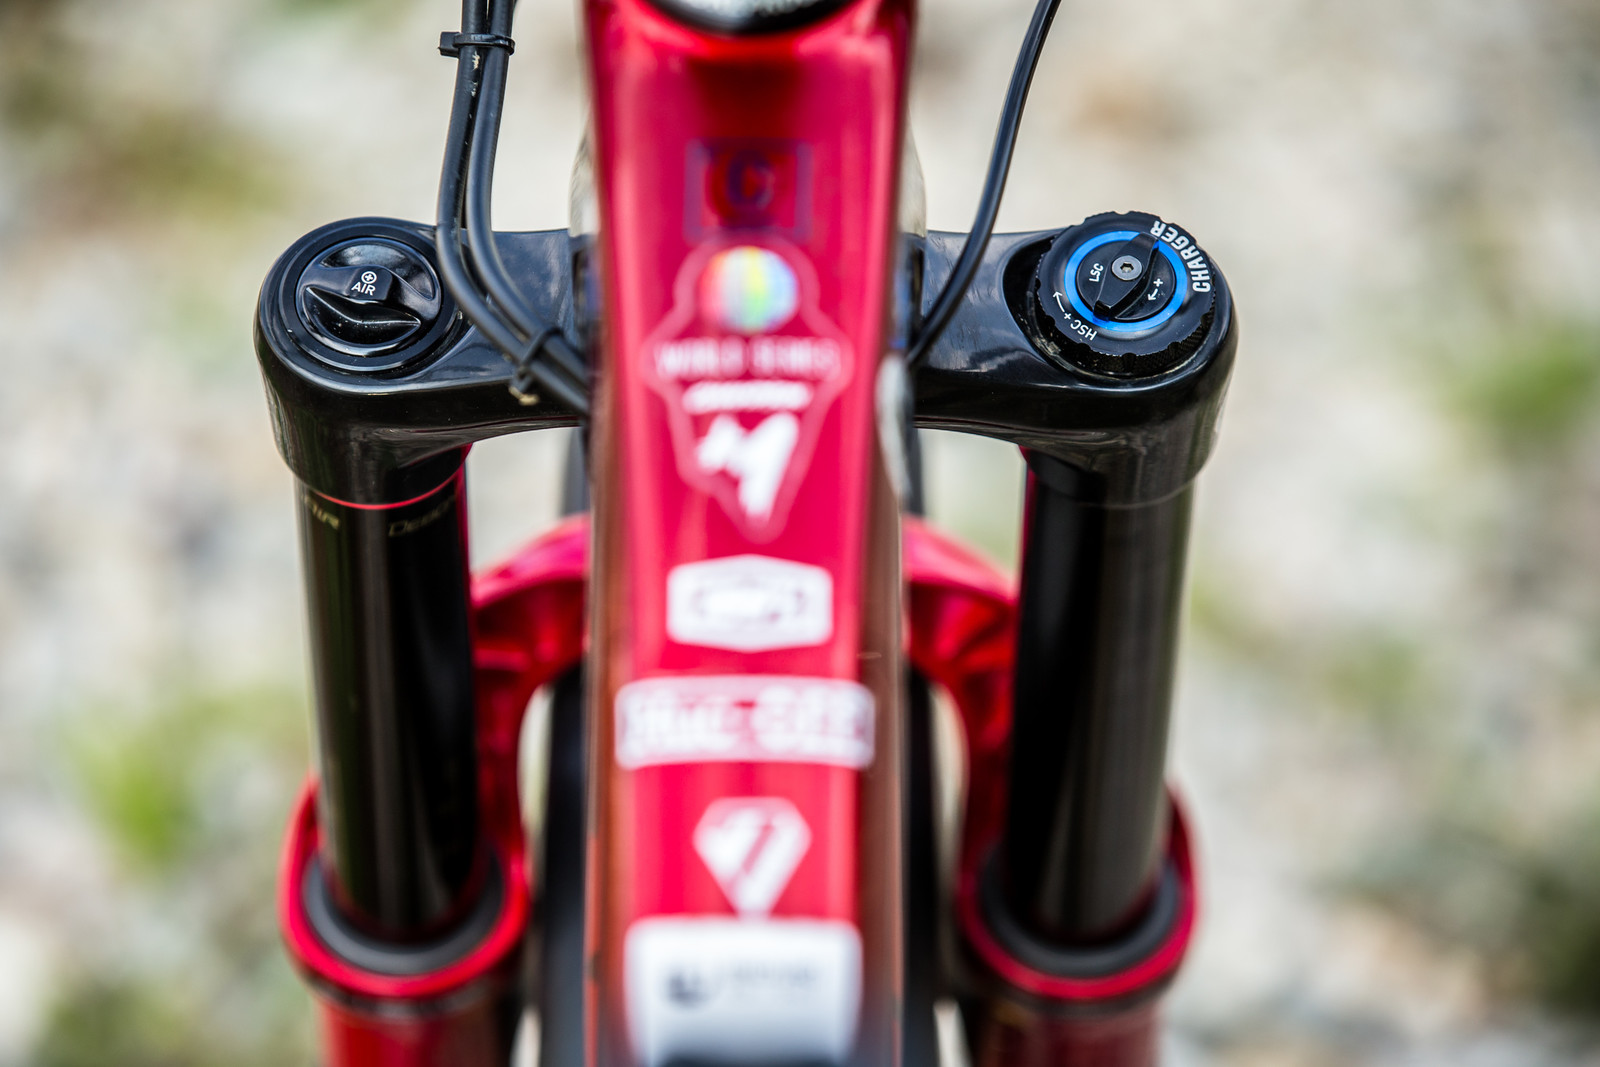 RockShox Lyrik with Charger Damper - WINNING BIKE - Sam Hill's Nukeproof Mega 275 - Mountain Biking Pictures - Vital MTB